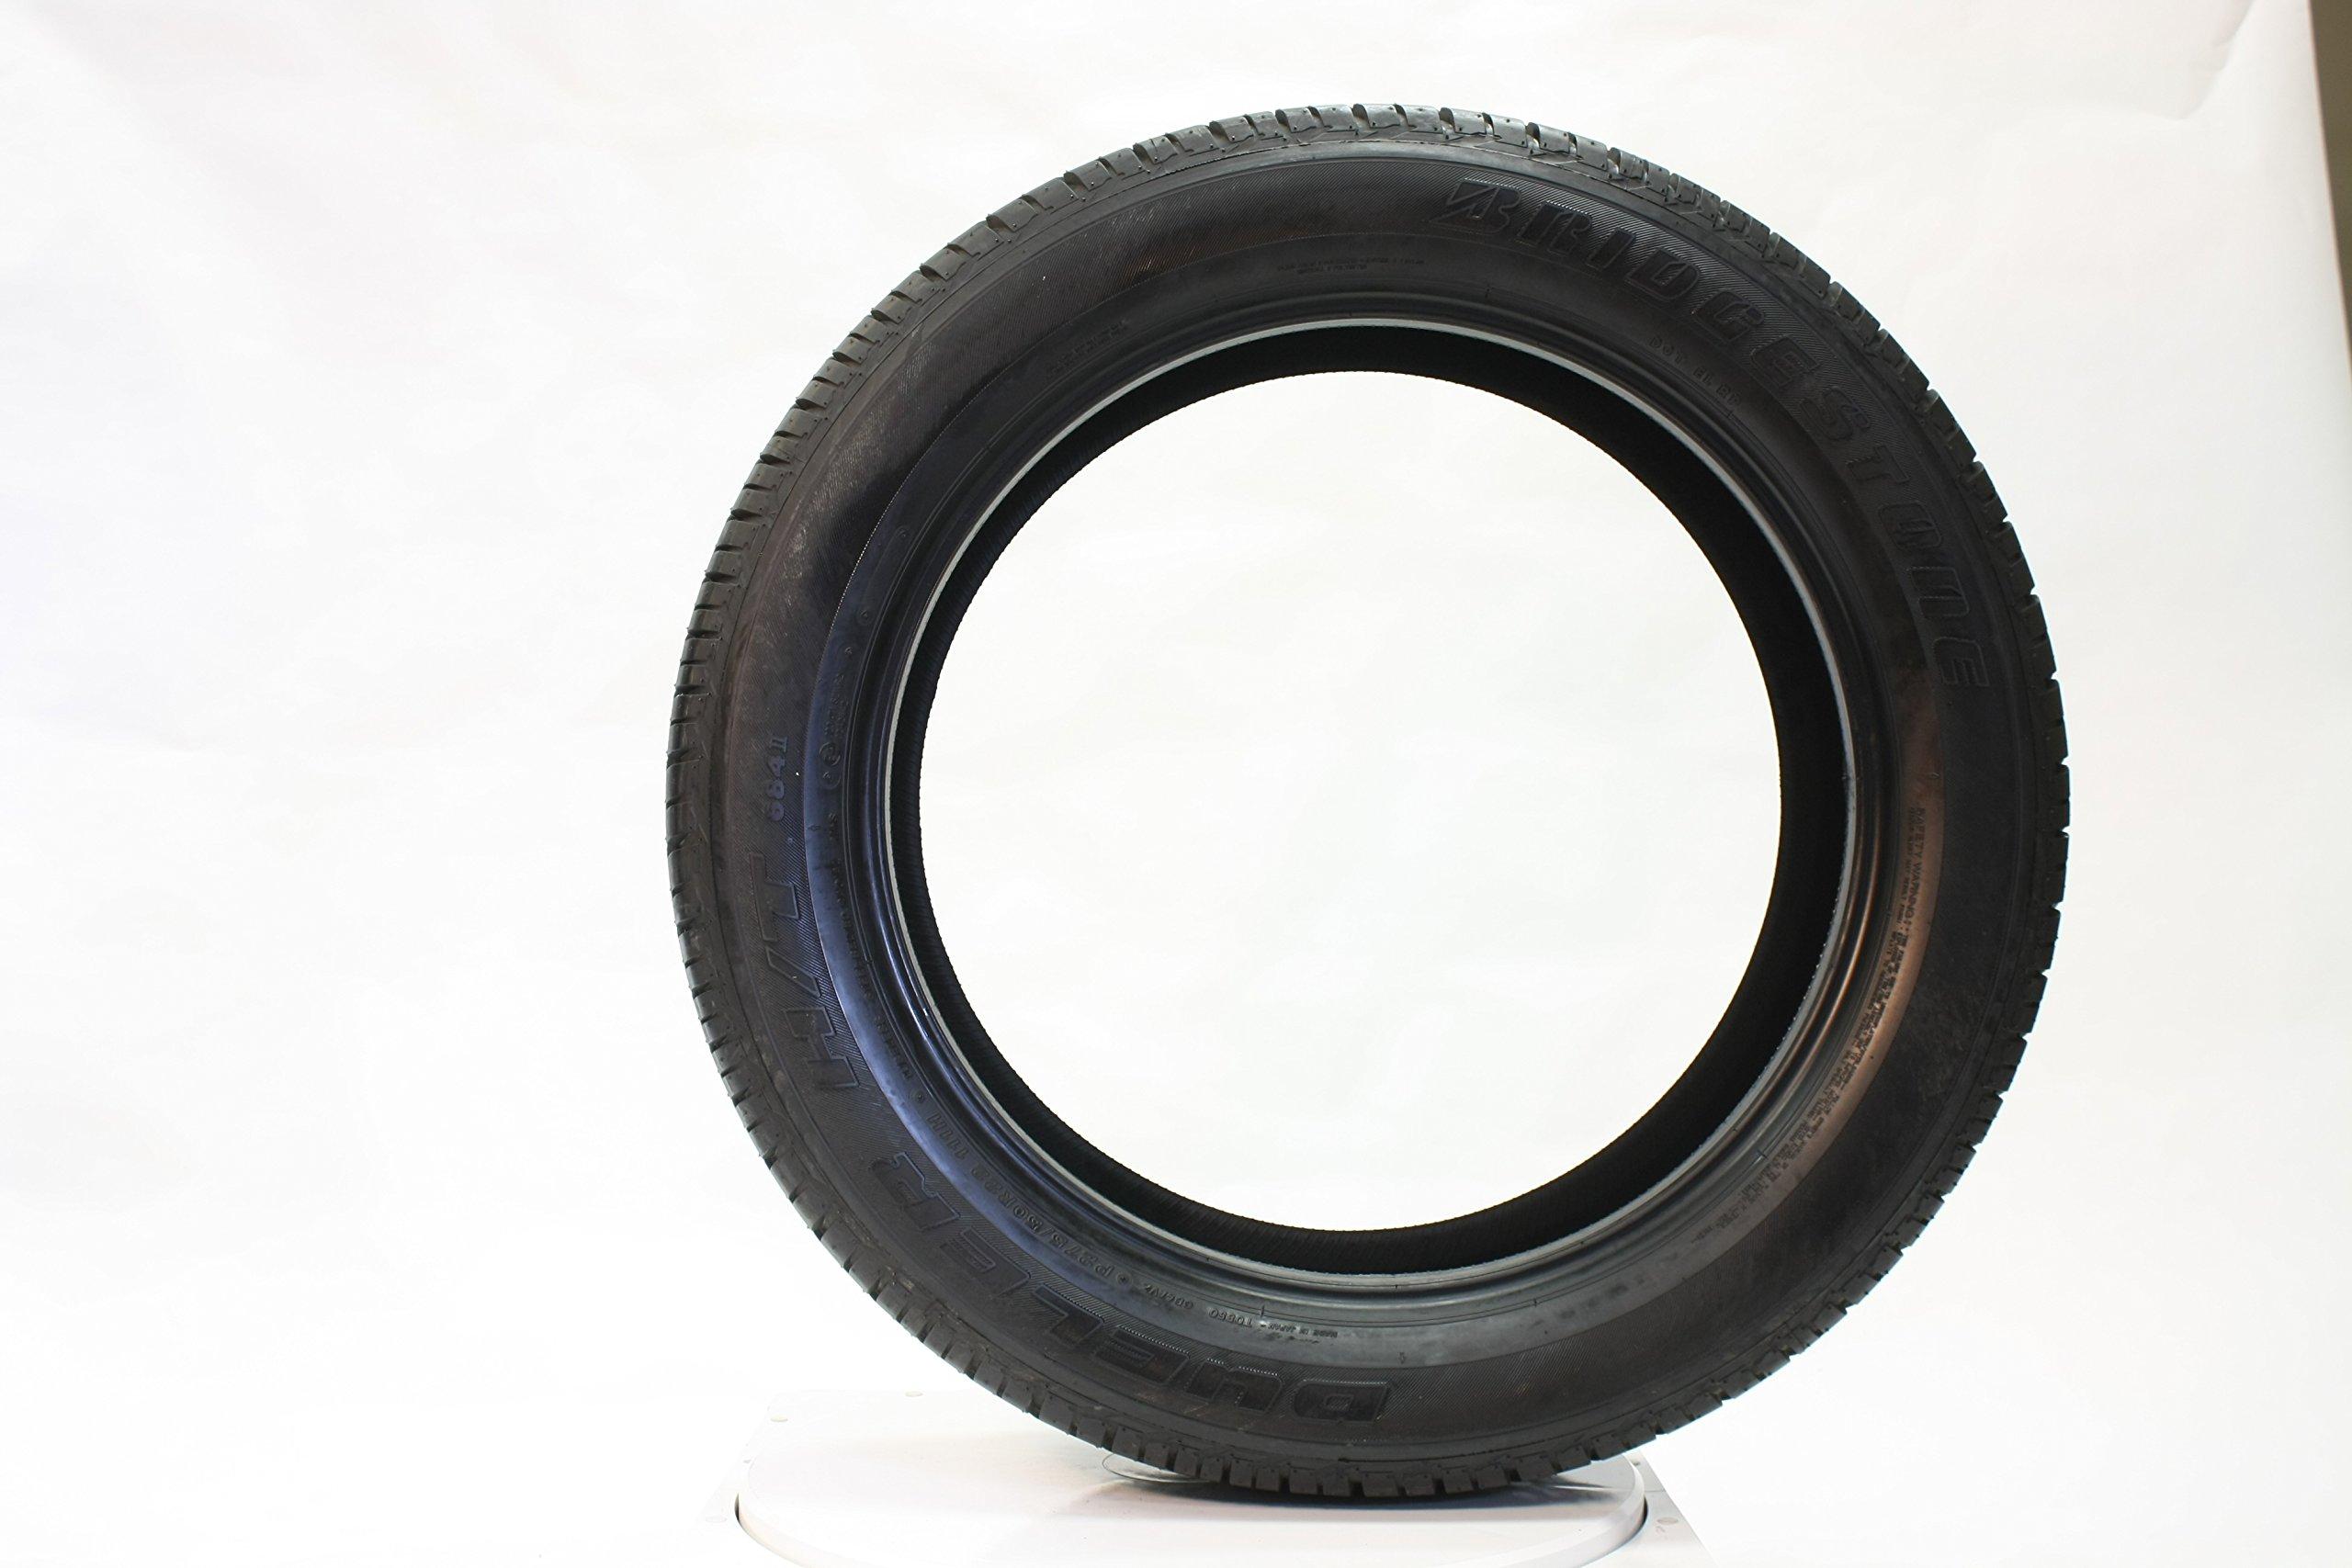 Bridgestone Dueler H/T 684 II All-Season Radial Tire - 255/70R18 112T by Bridgestone (Image #2)